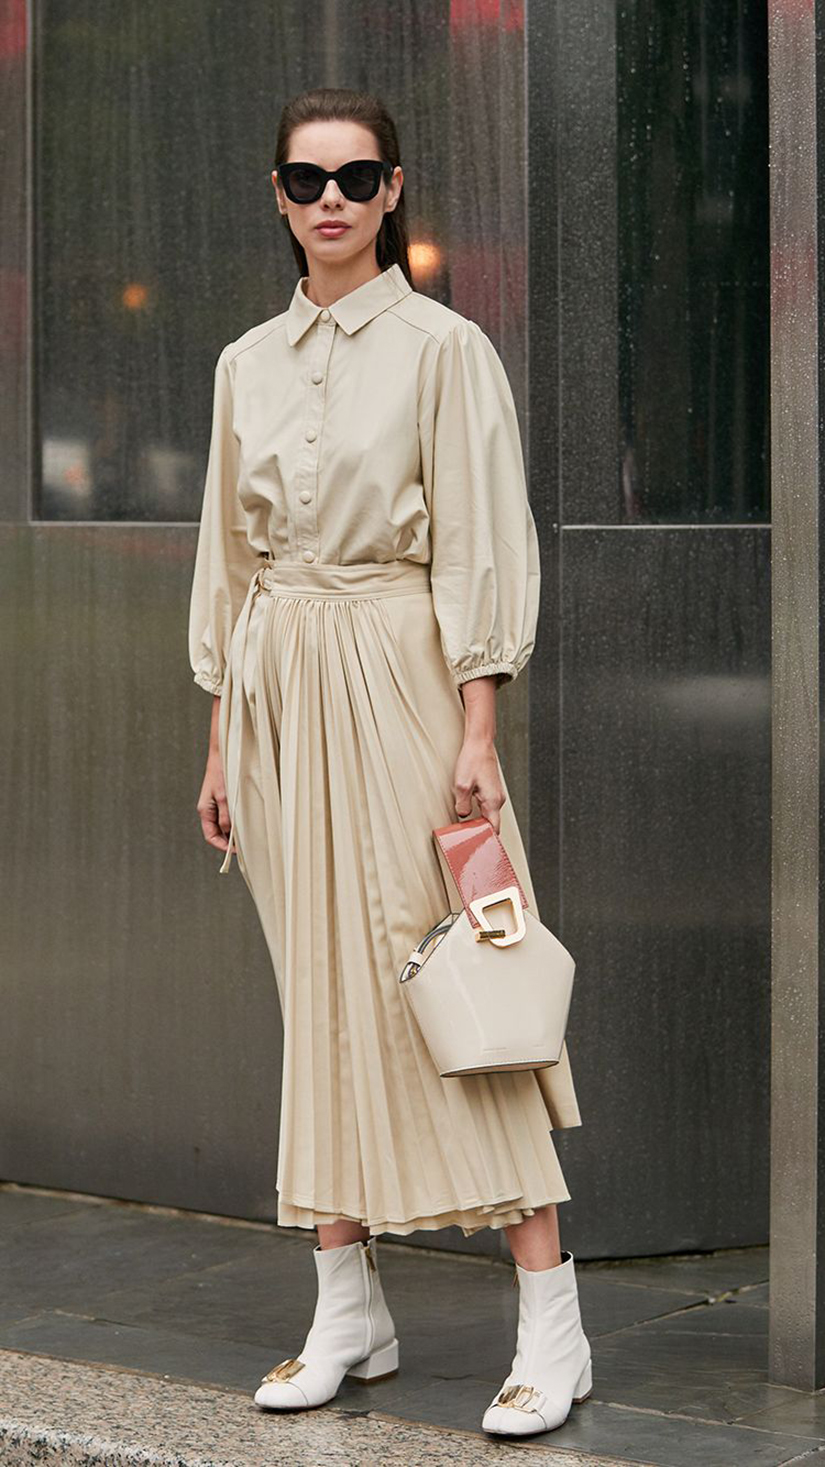 váy xếp ly màu kem trang phục monochrome boots cao cổ